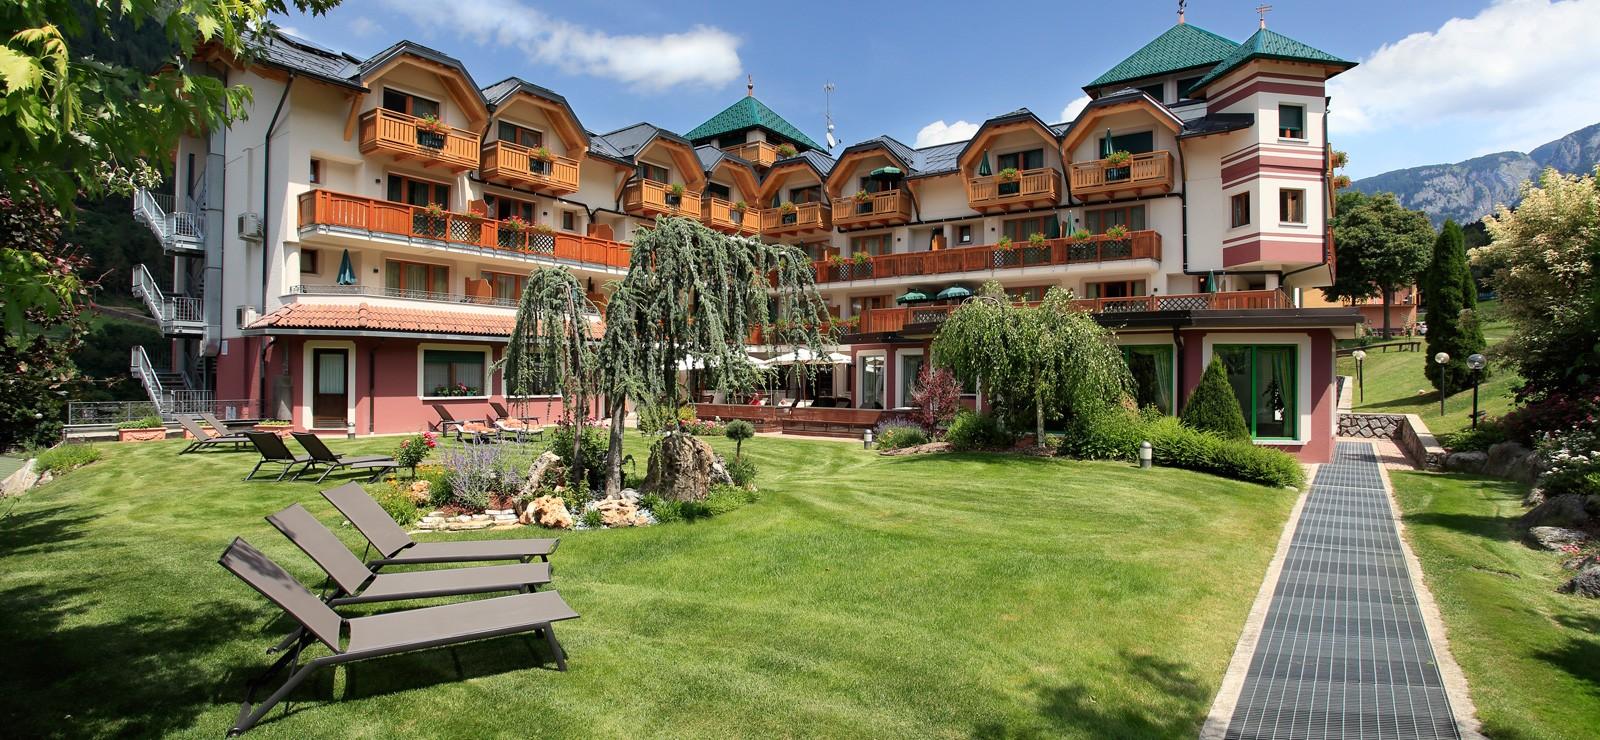 Tevini - Dolomites Charming Hotel Bilder | Bild 1